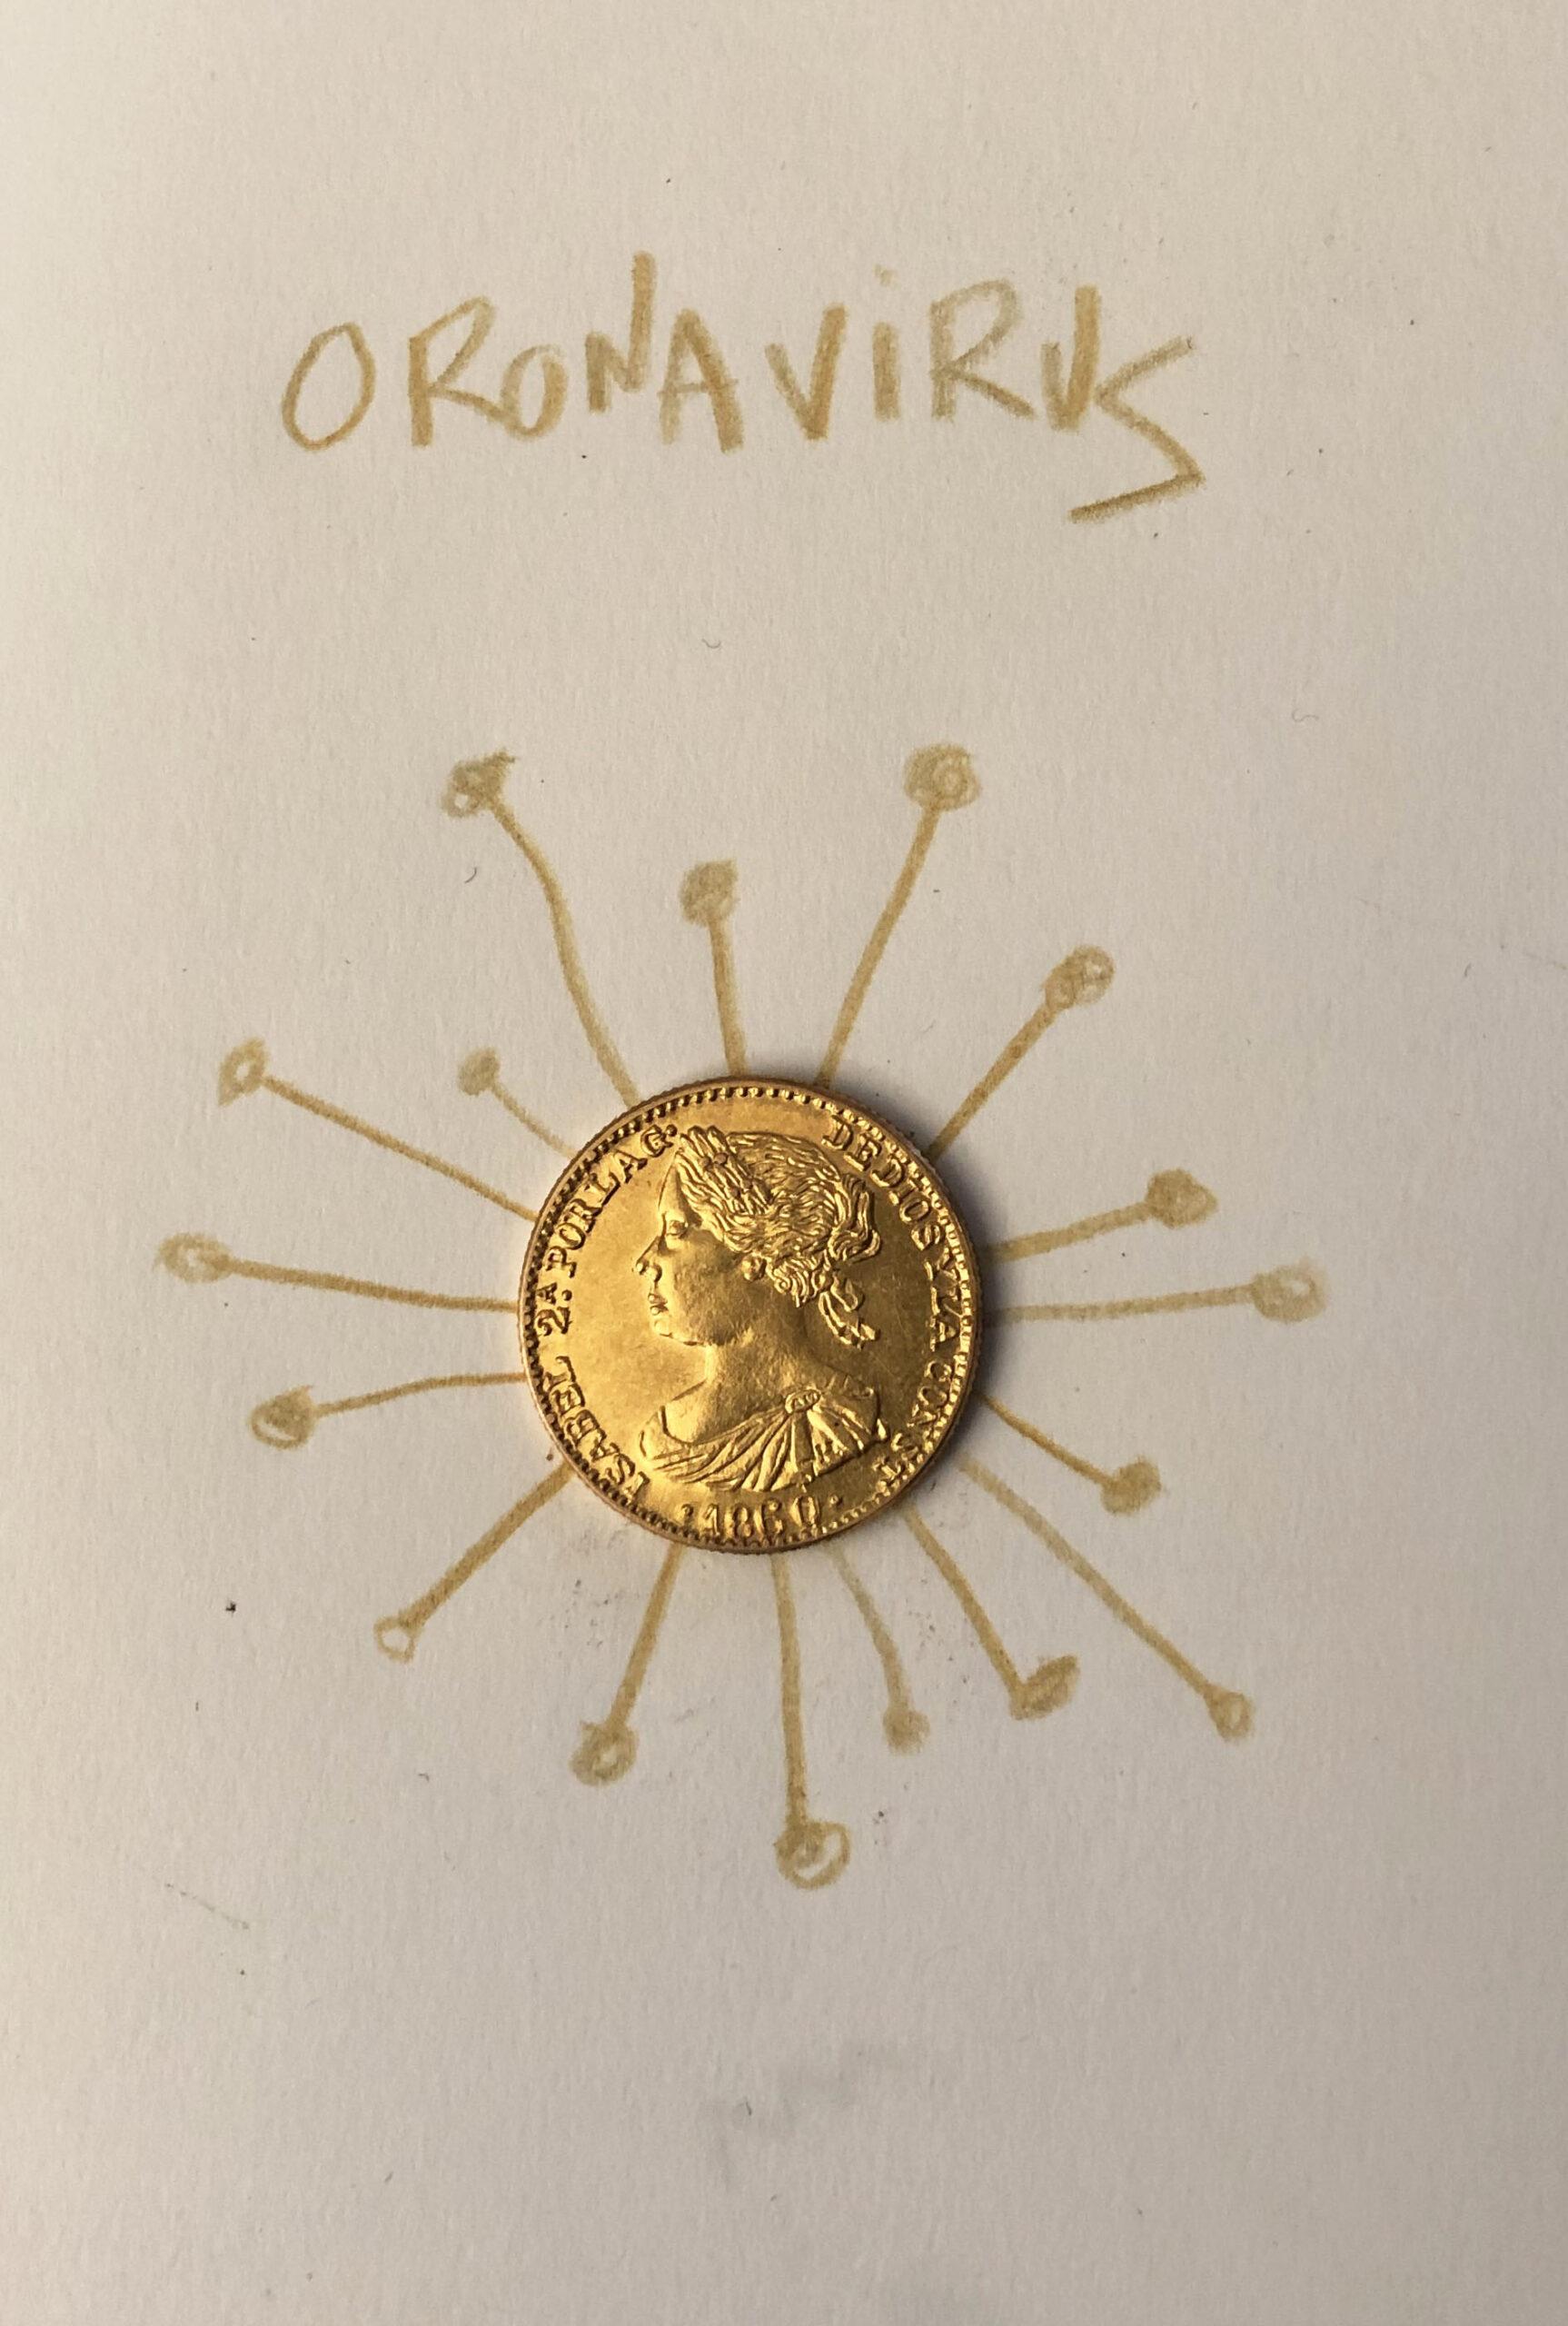 oronavirusVERA